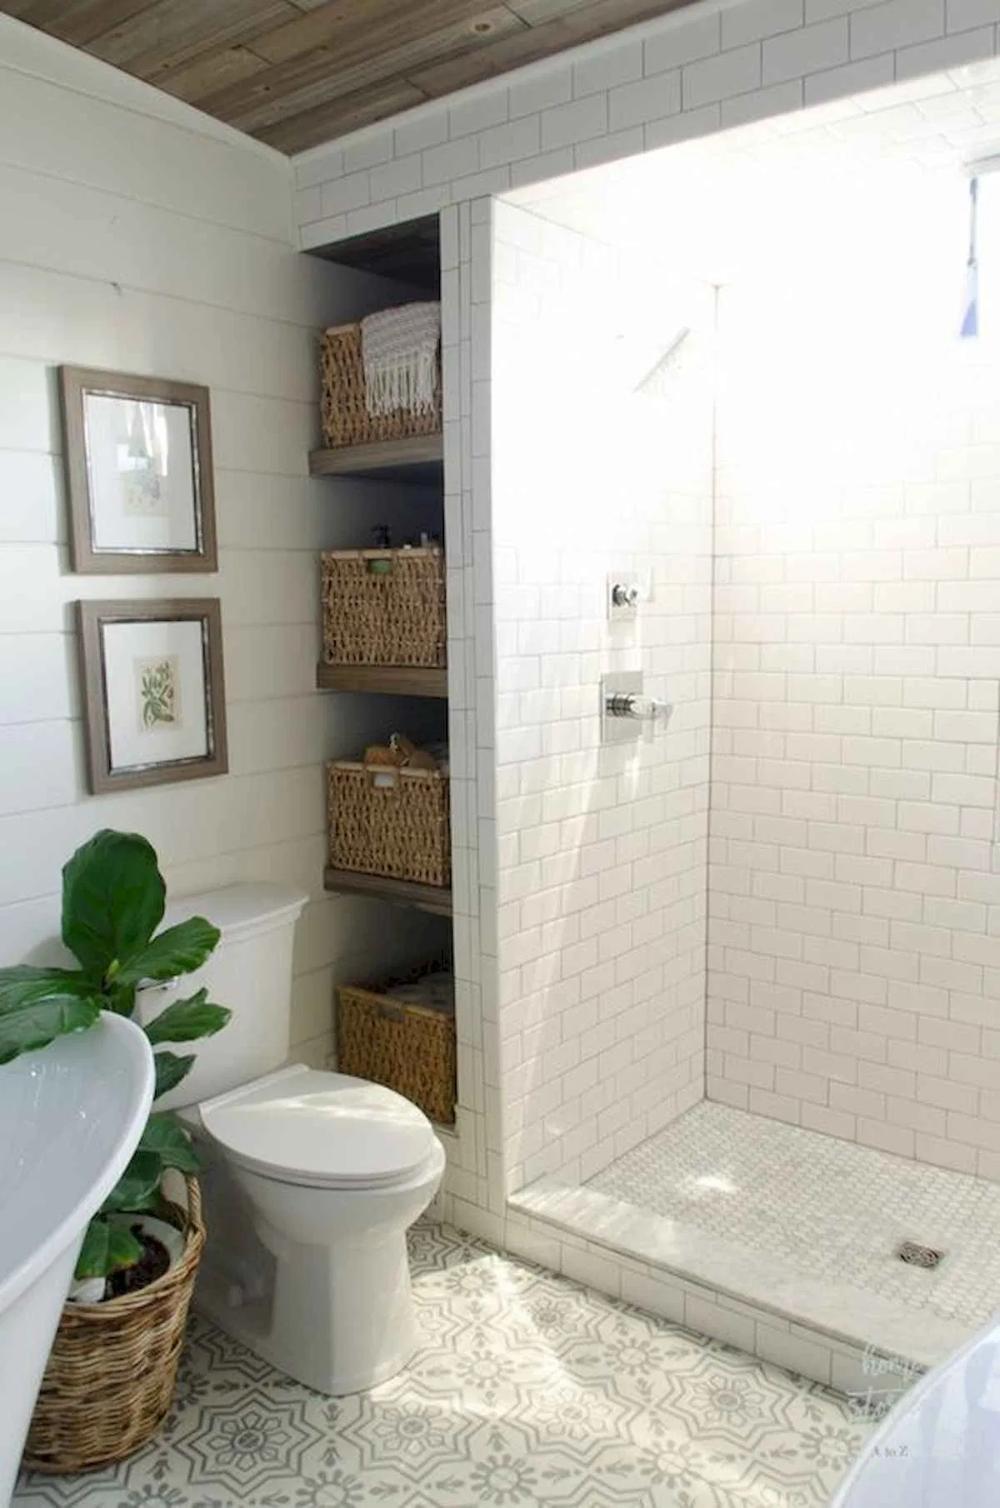 55 Fresh Small Master Bathroom Remodel Ideas And Design 36 Livingmarch Com Master Bathroom Makeover Small Bathroom Remodel Bathrooms Remodel